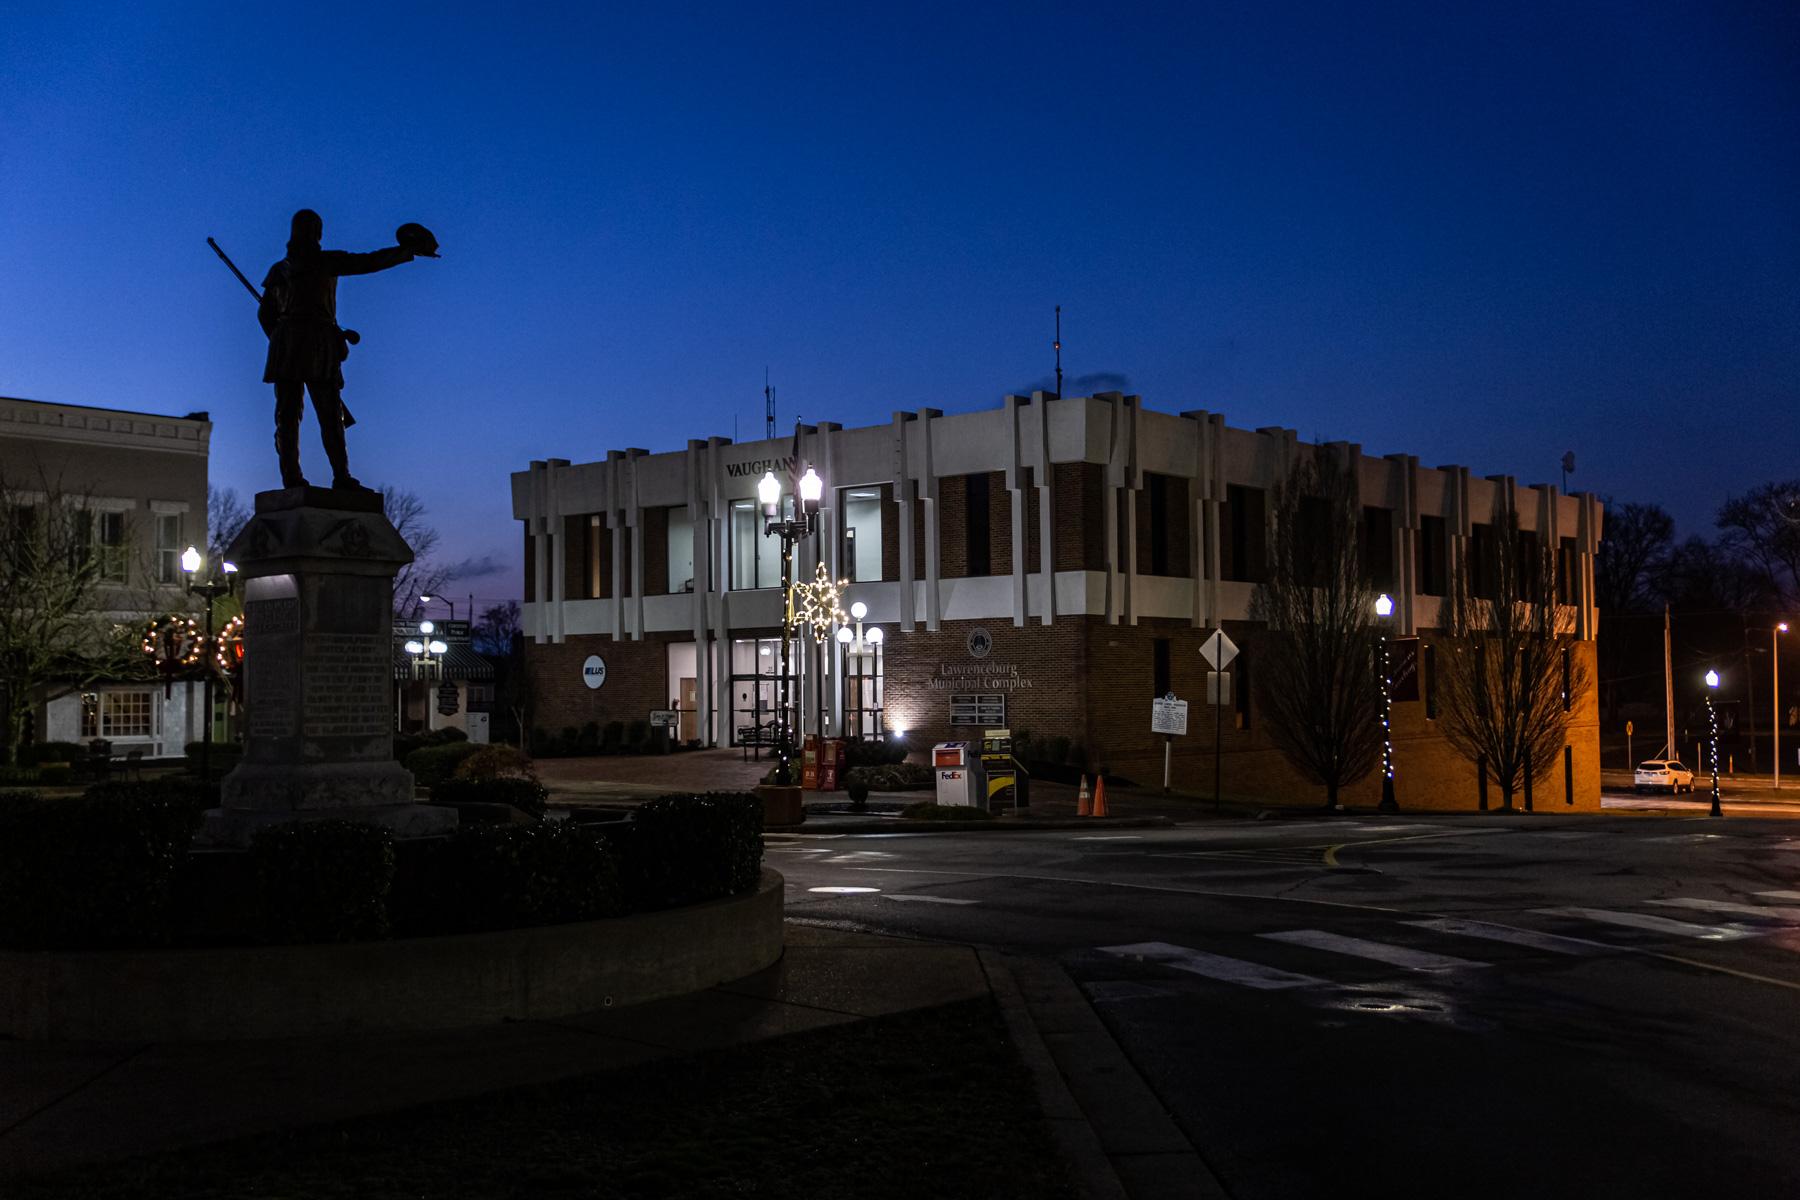 david crockett state at night